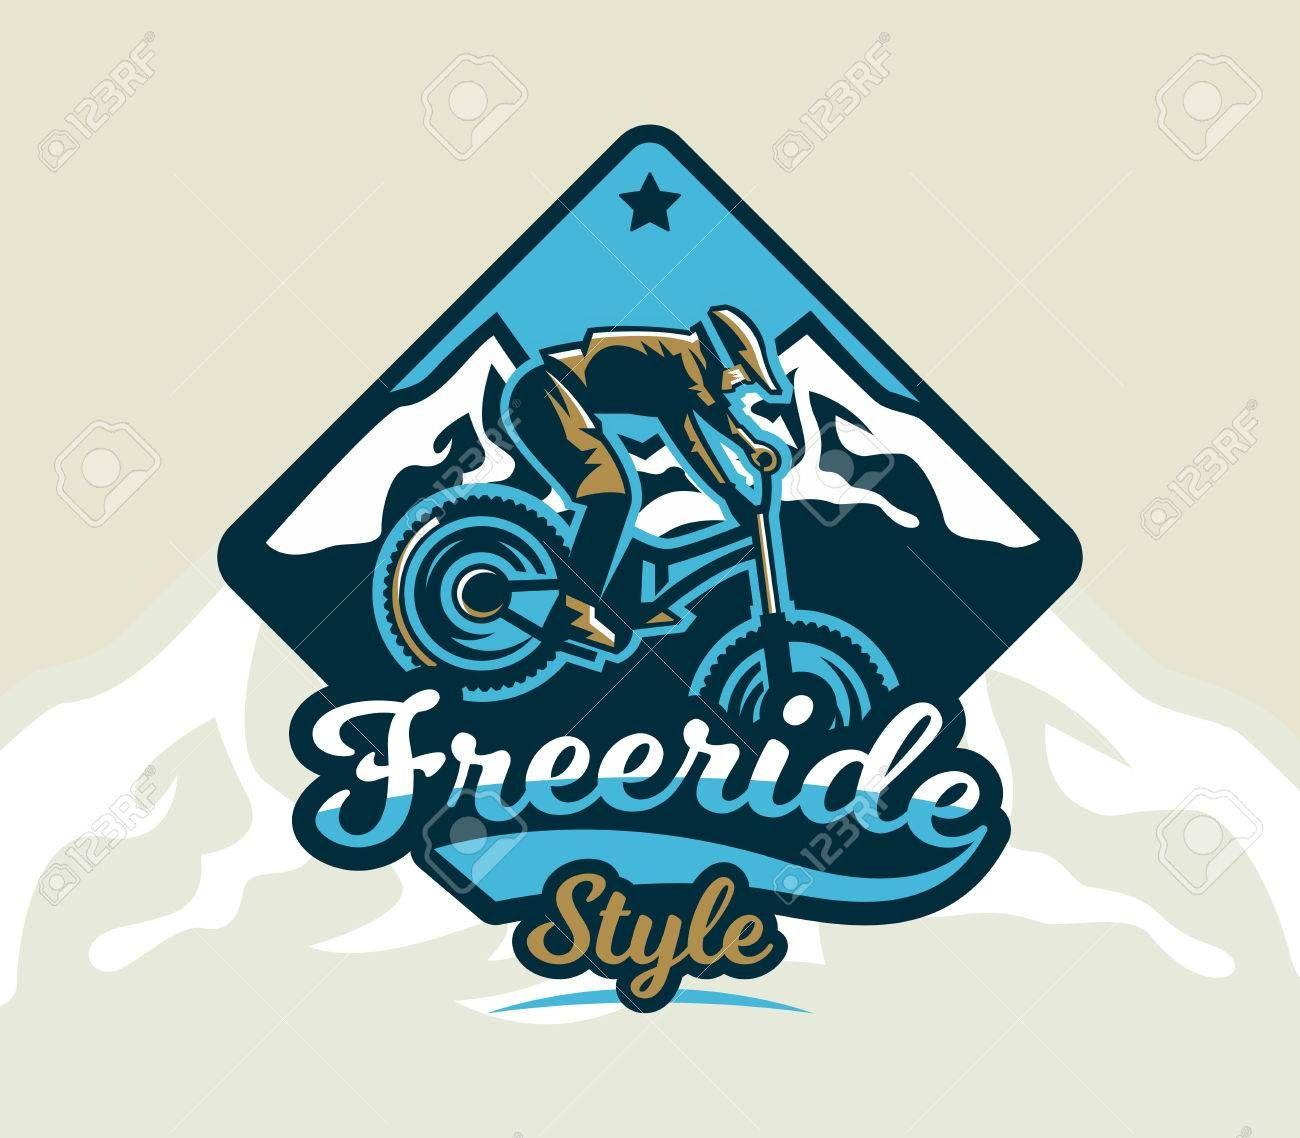 Mountain Bike Club